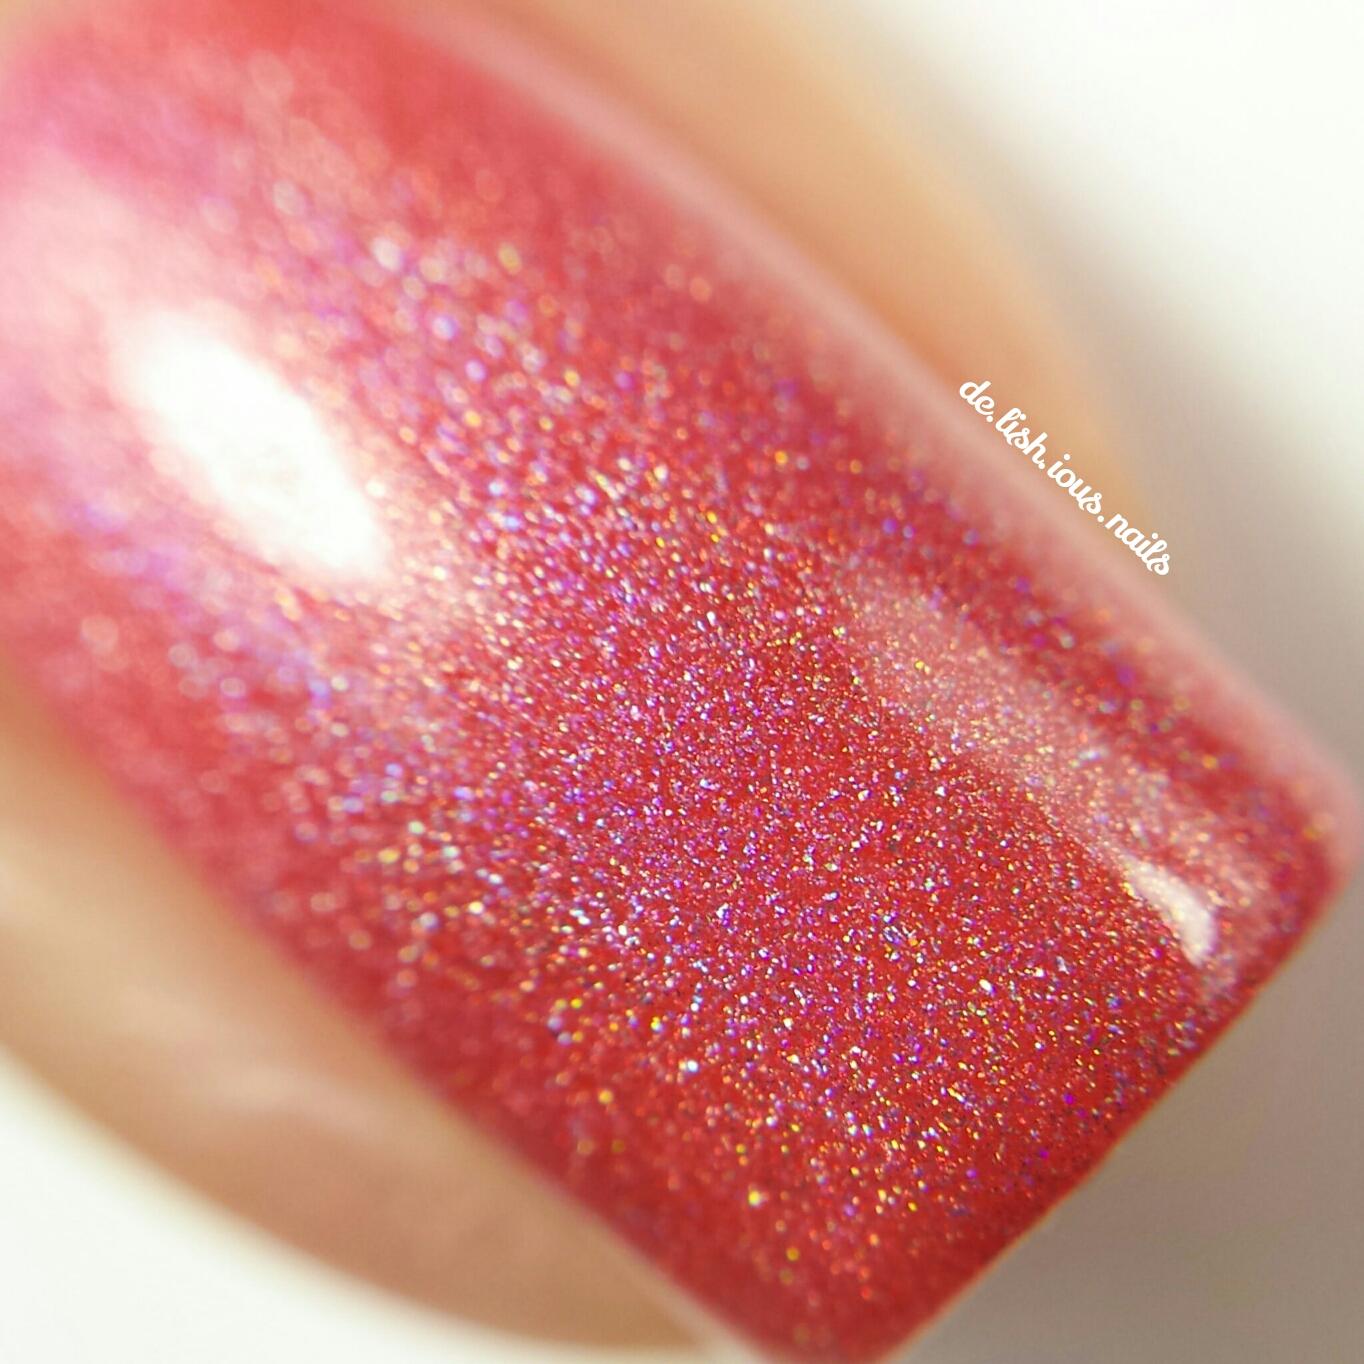 glam-polish-can-you-please-spell-gabbana-4.jpg.jpeg